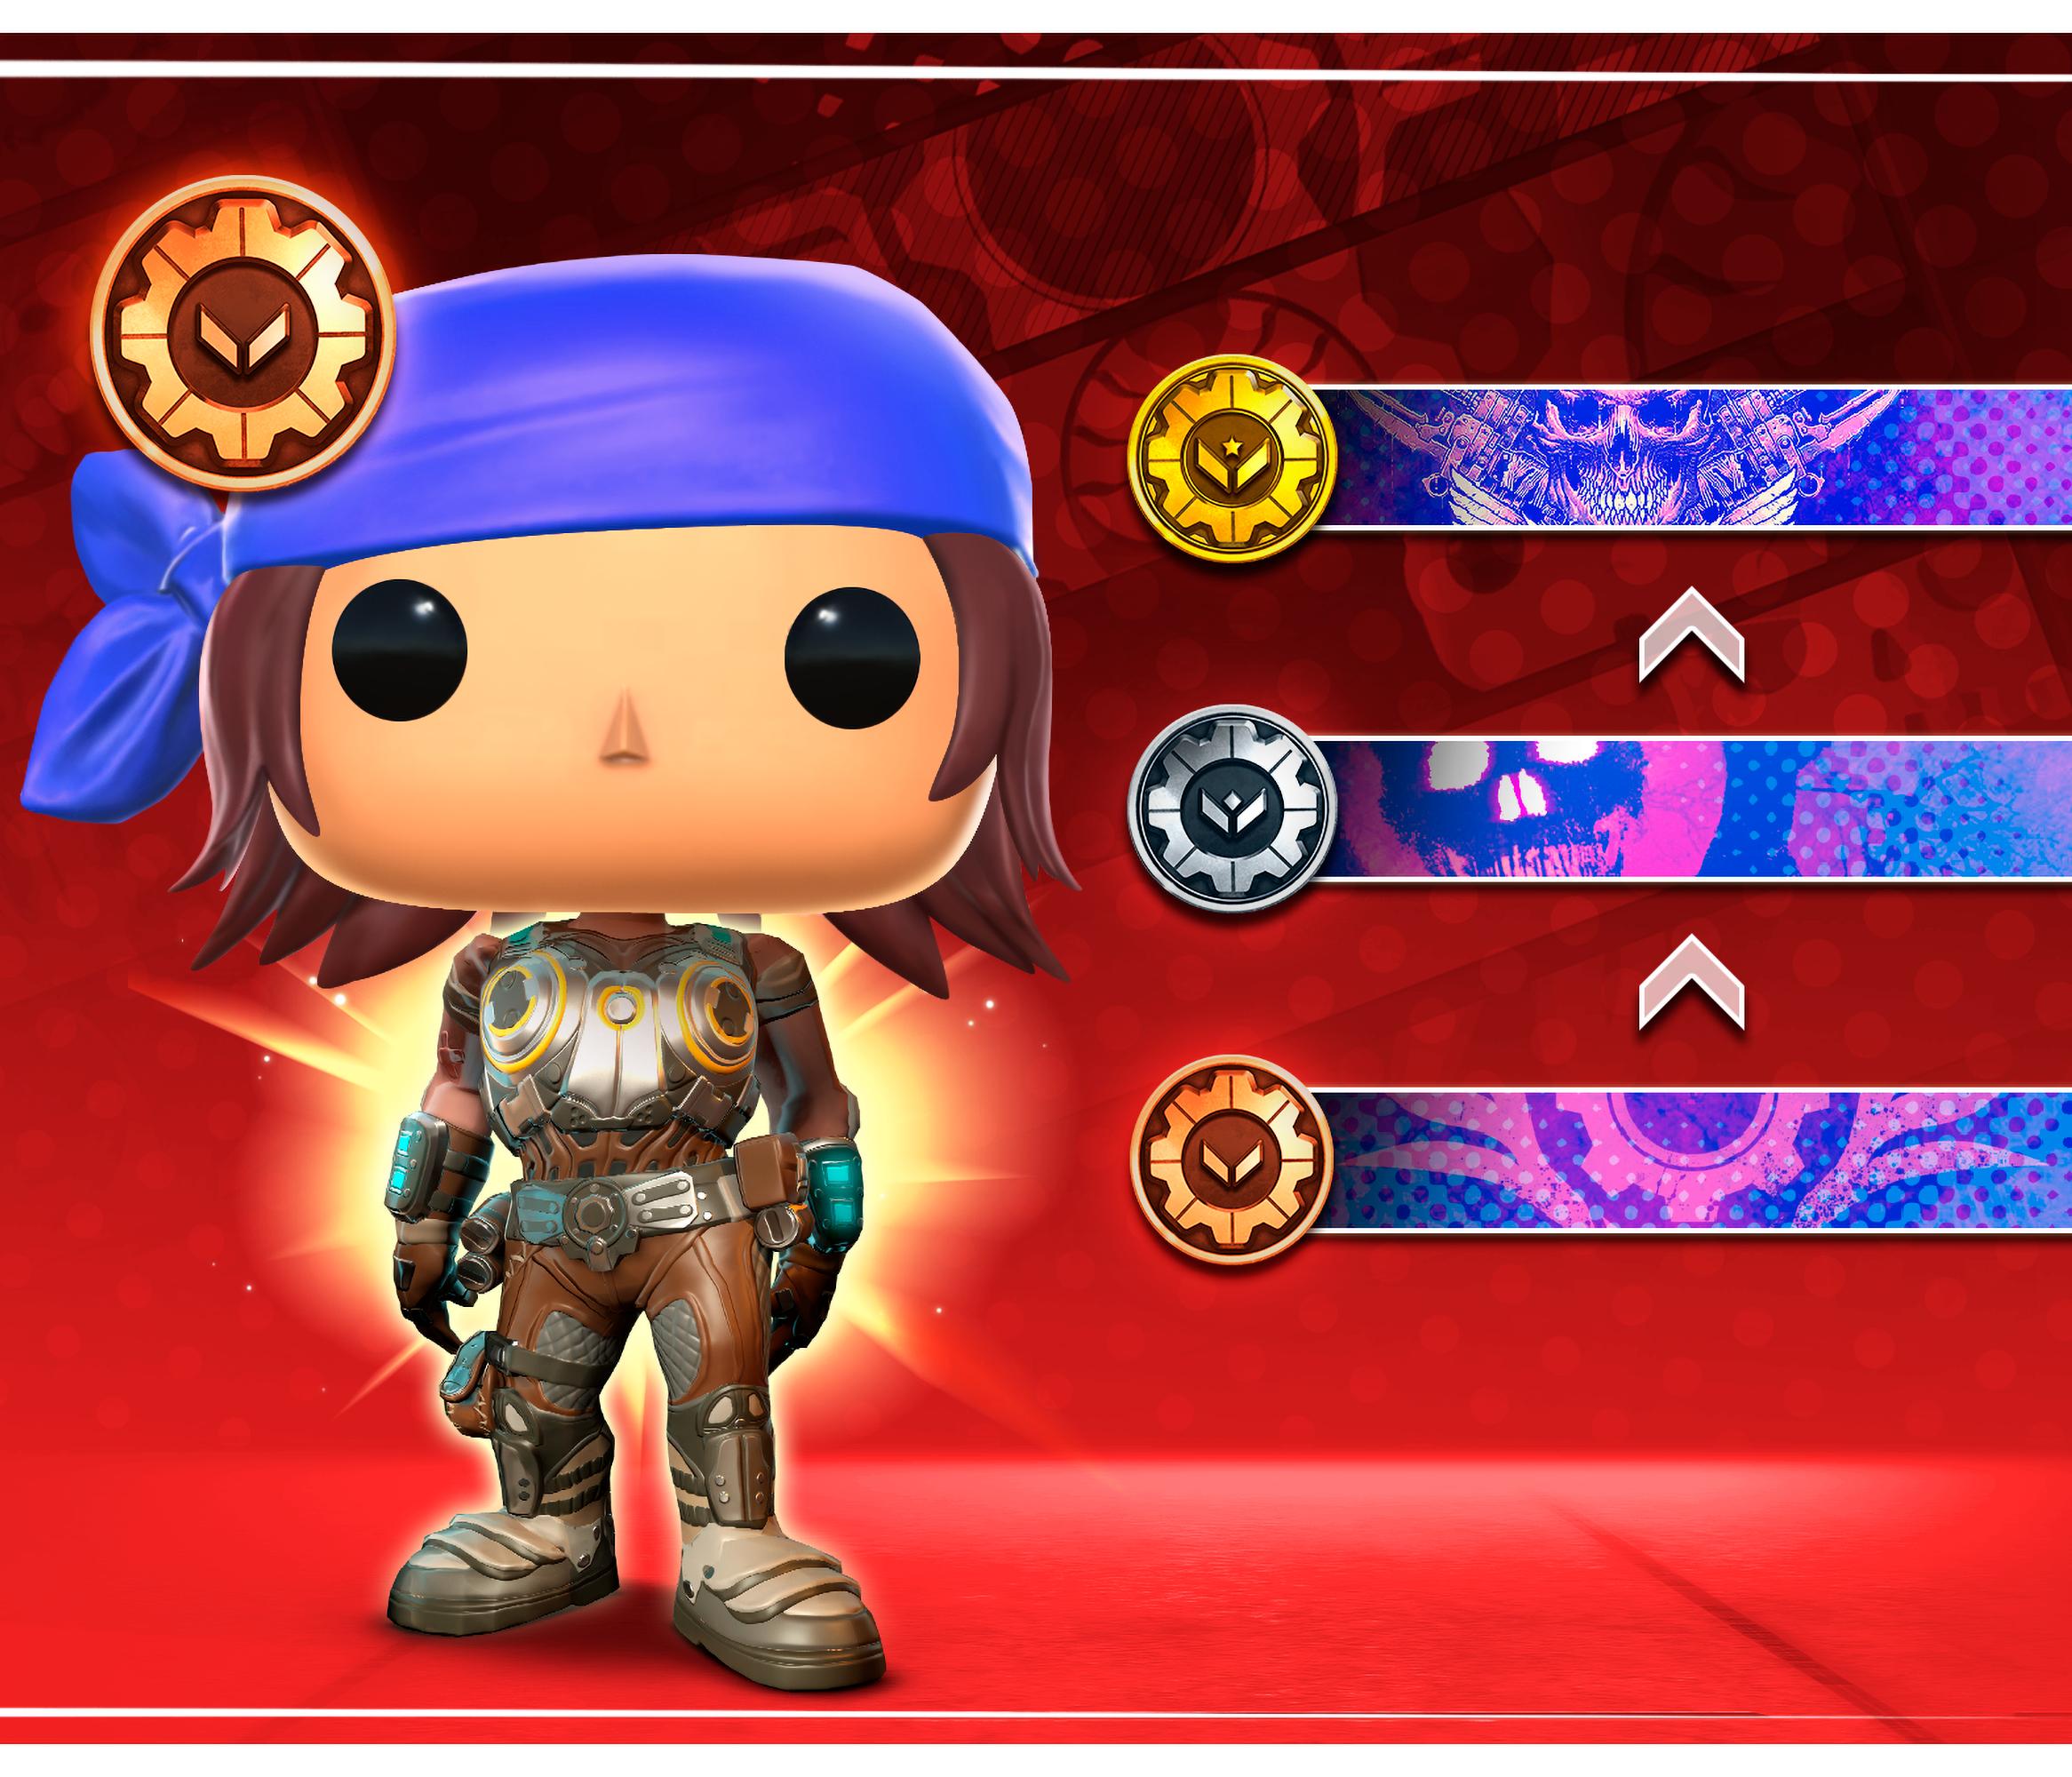 Gears POP! Avatar wearing Anya's armor and showcasing emblem rewards for Season 9